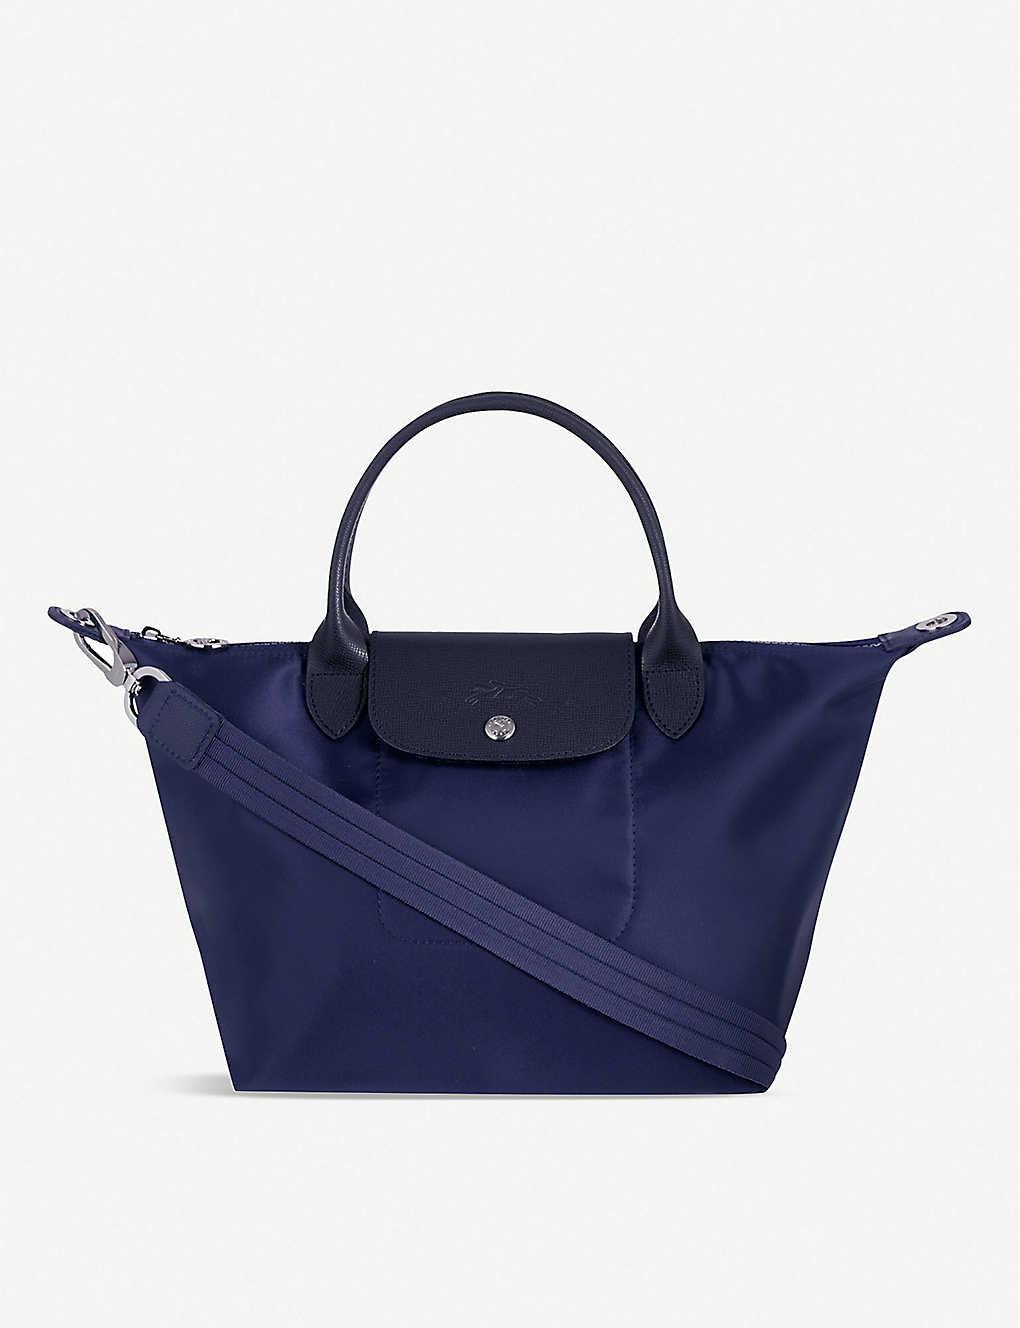 new product 0bfc8 5c268 Le Pliage Neo medium handbag - Navy ...